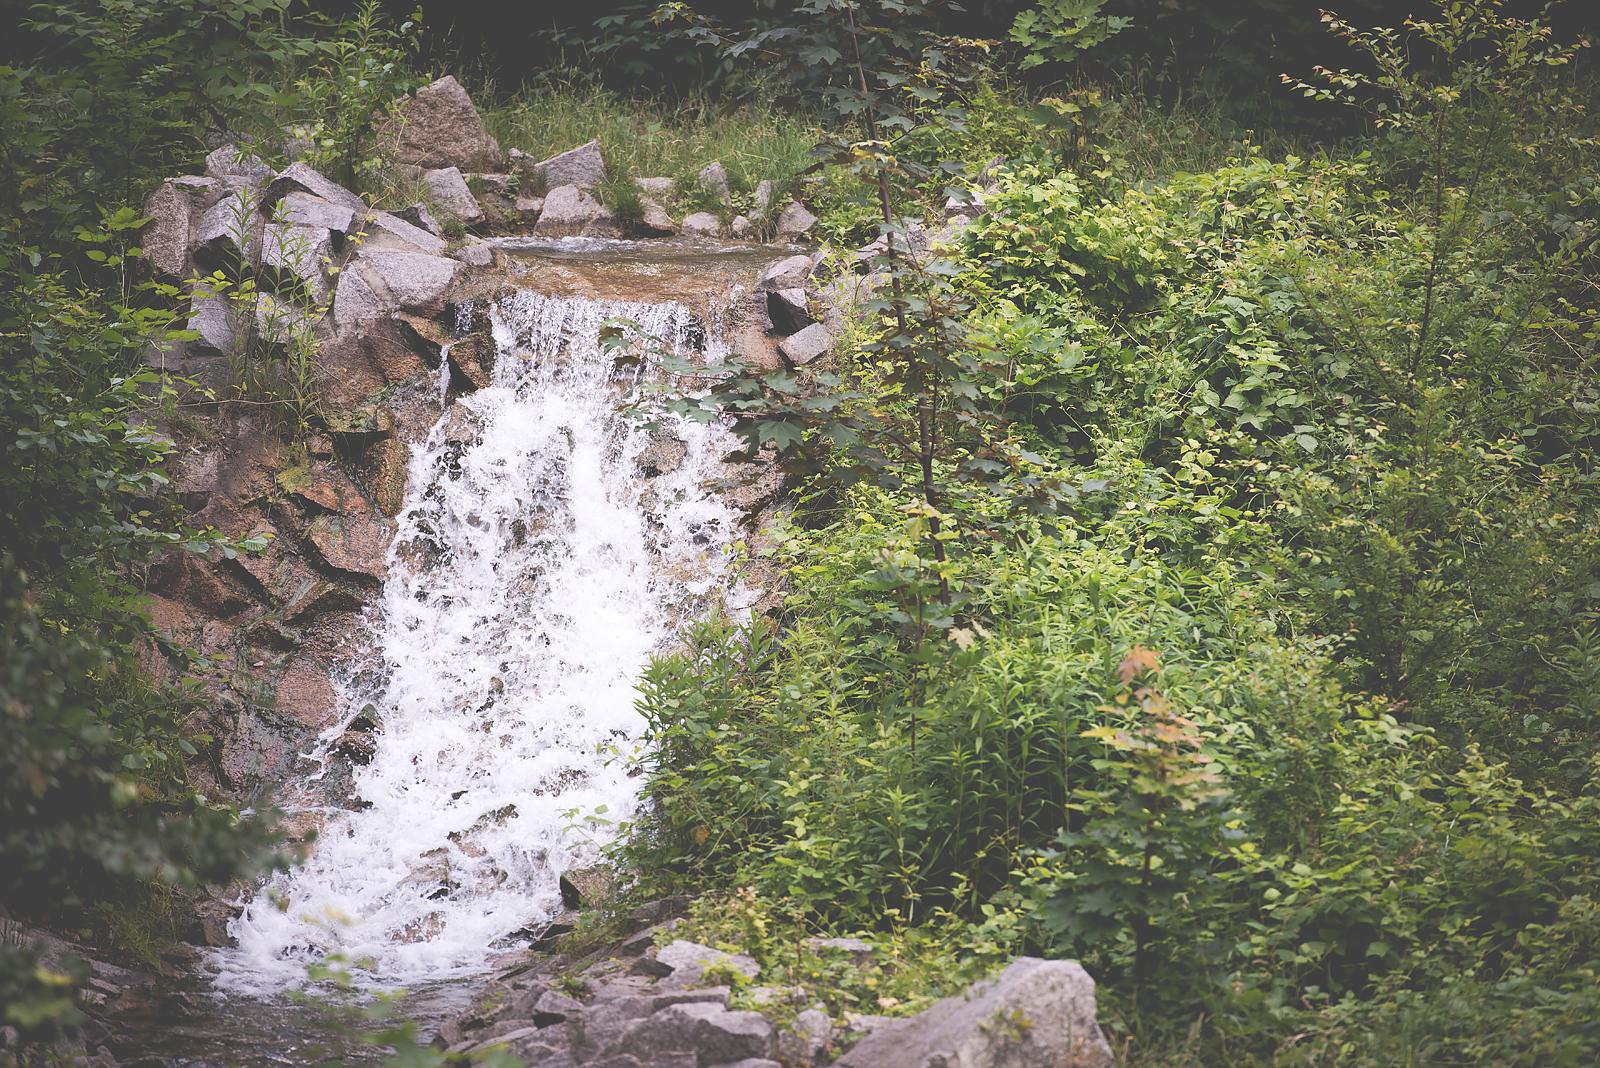 wodospad wroclaw zoo